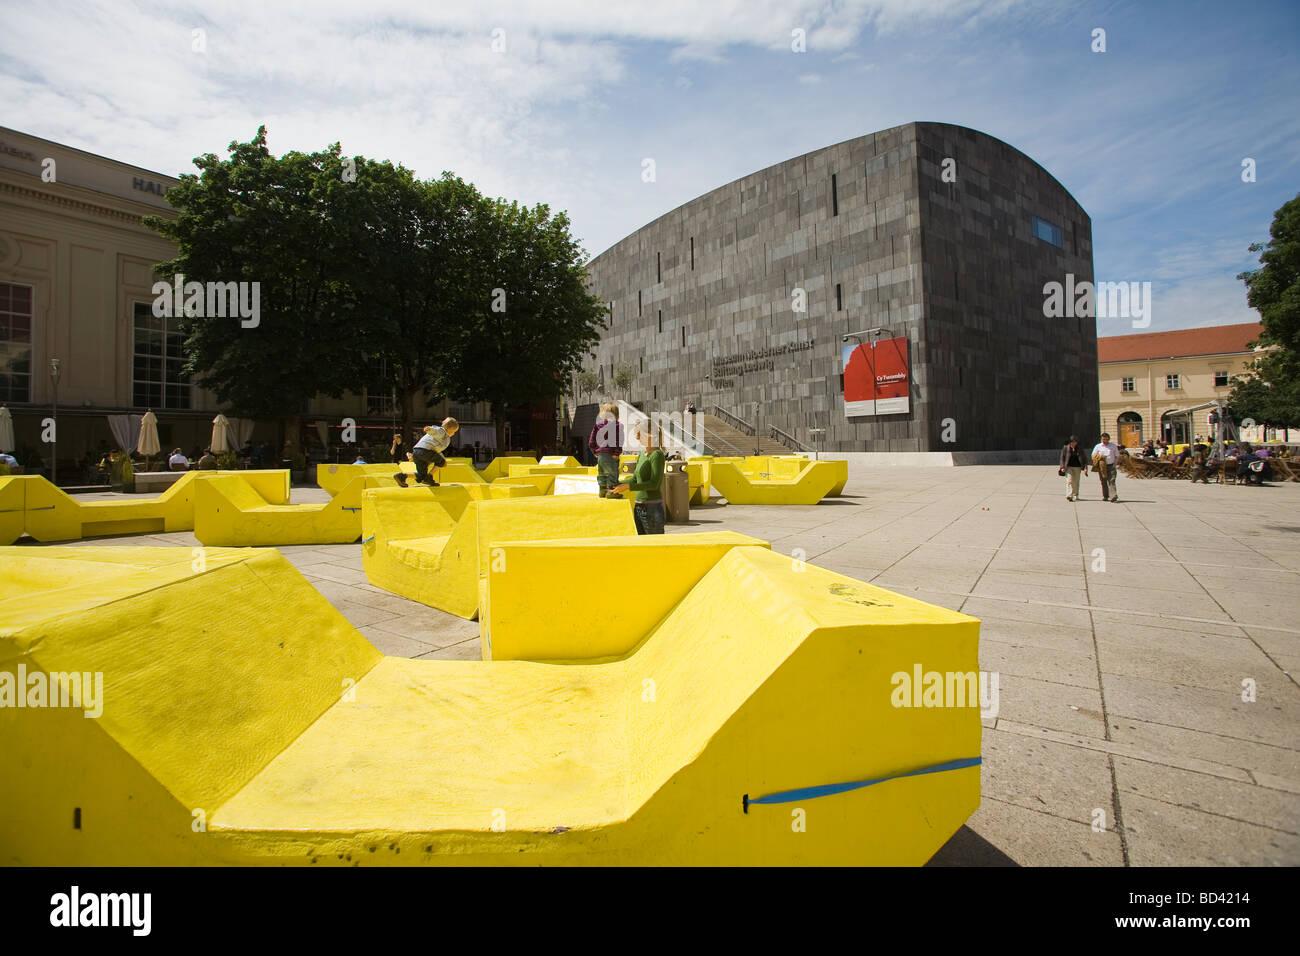 Vienna Museum District,  Museum Moderner Kunst - Stifung Ludwig, Wien - Stock Image